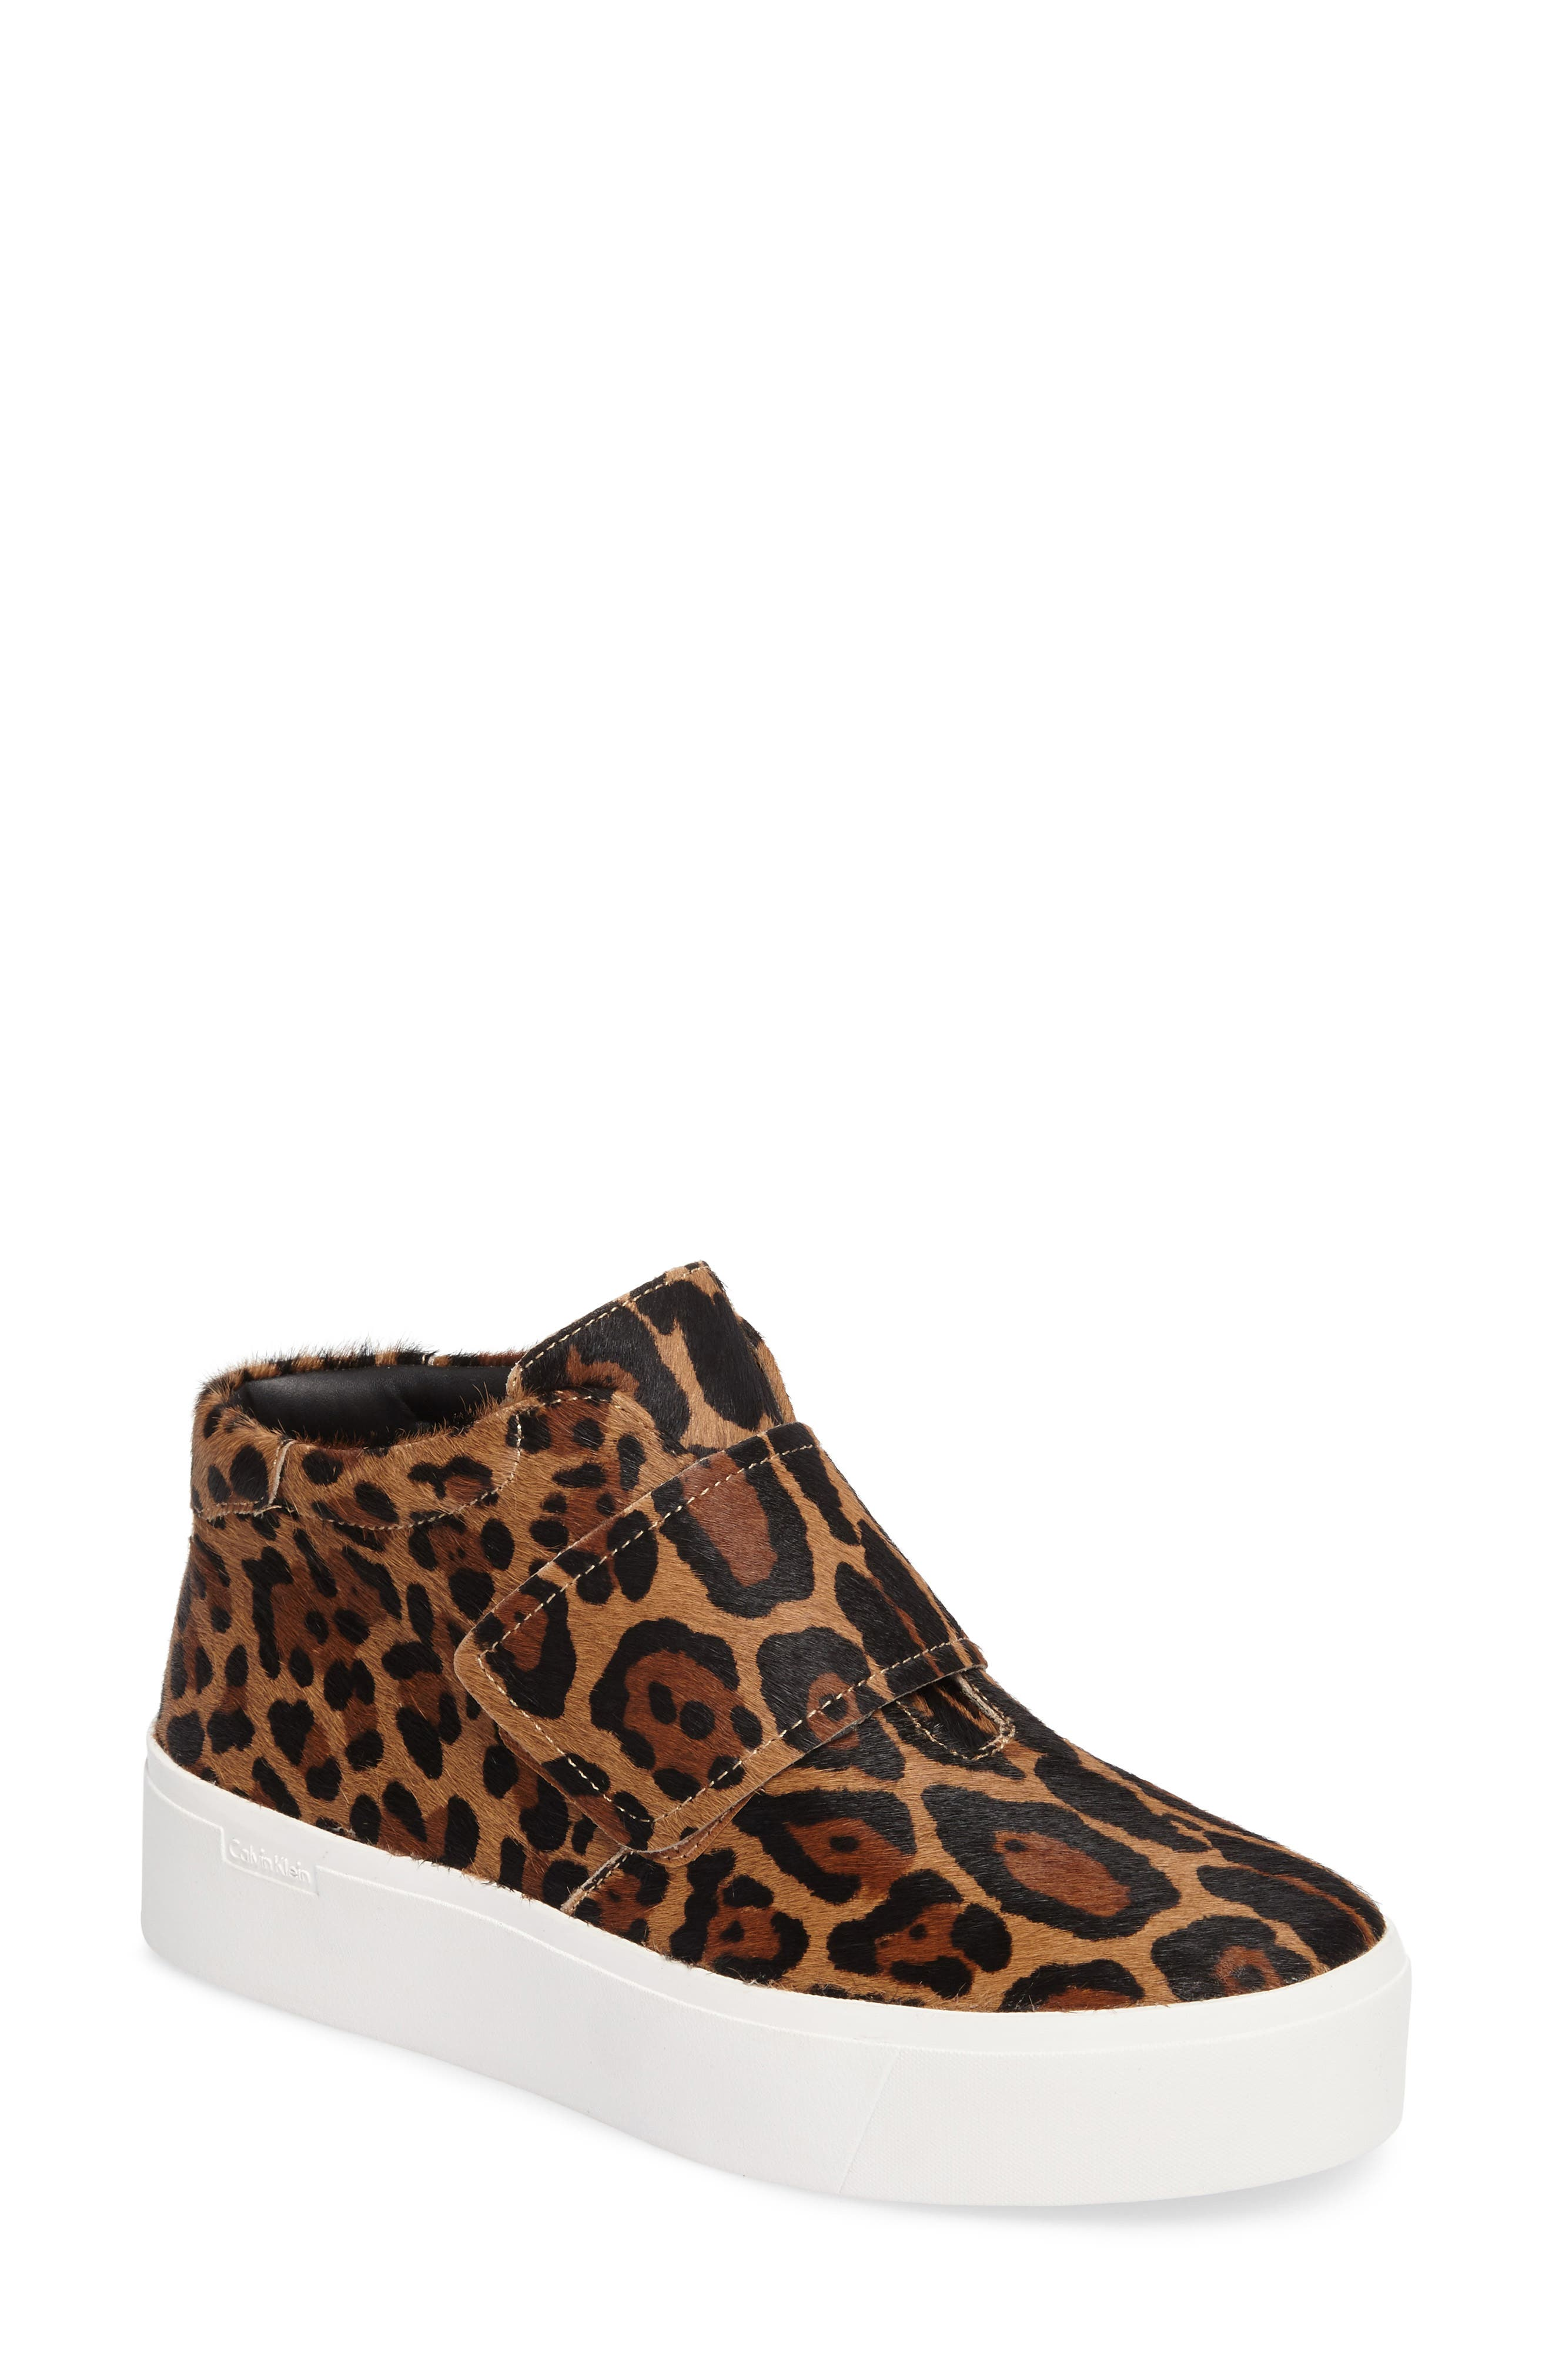 Alternate Image 1 Selected - Calvin Klein Jessamine Platform Sneaker (Women)